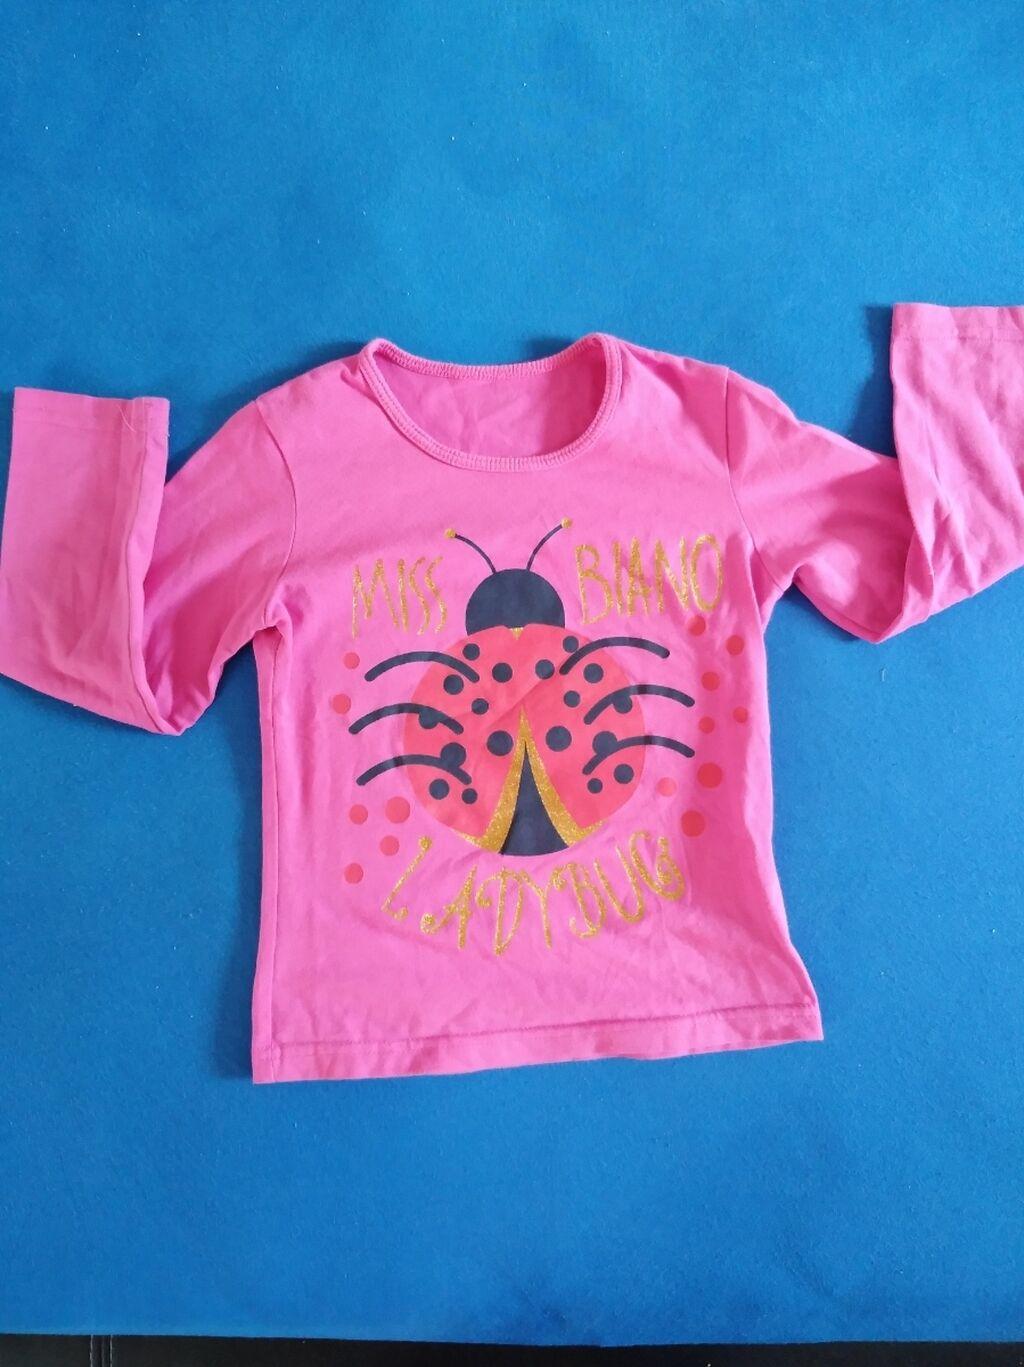 Dečije bluze i majice: Dečije bluze i majice